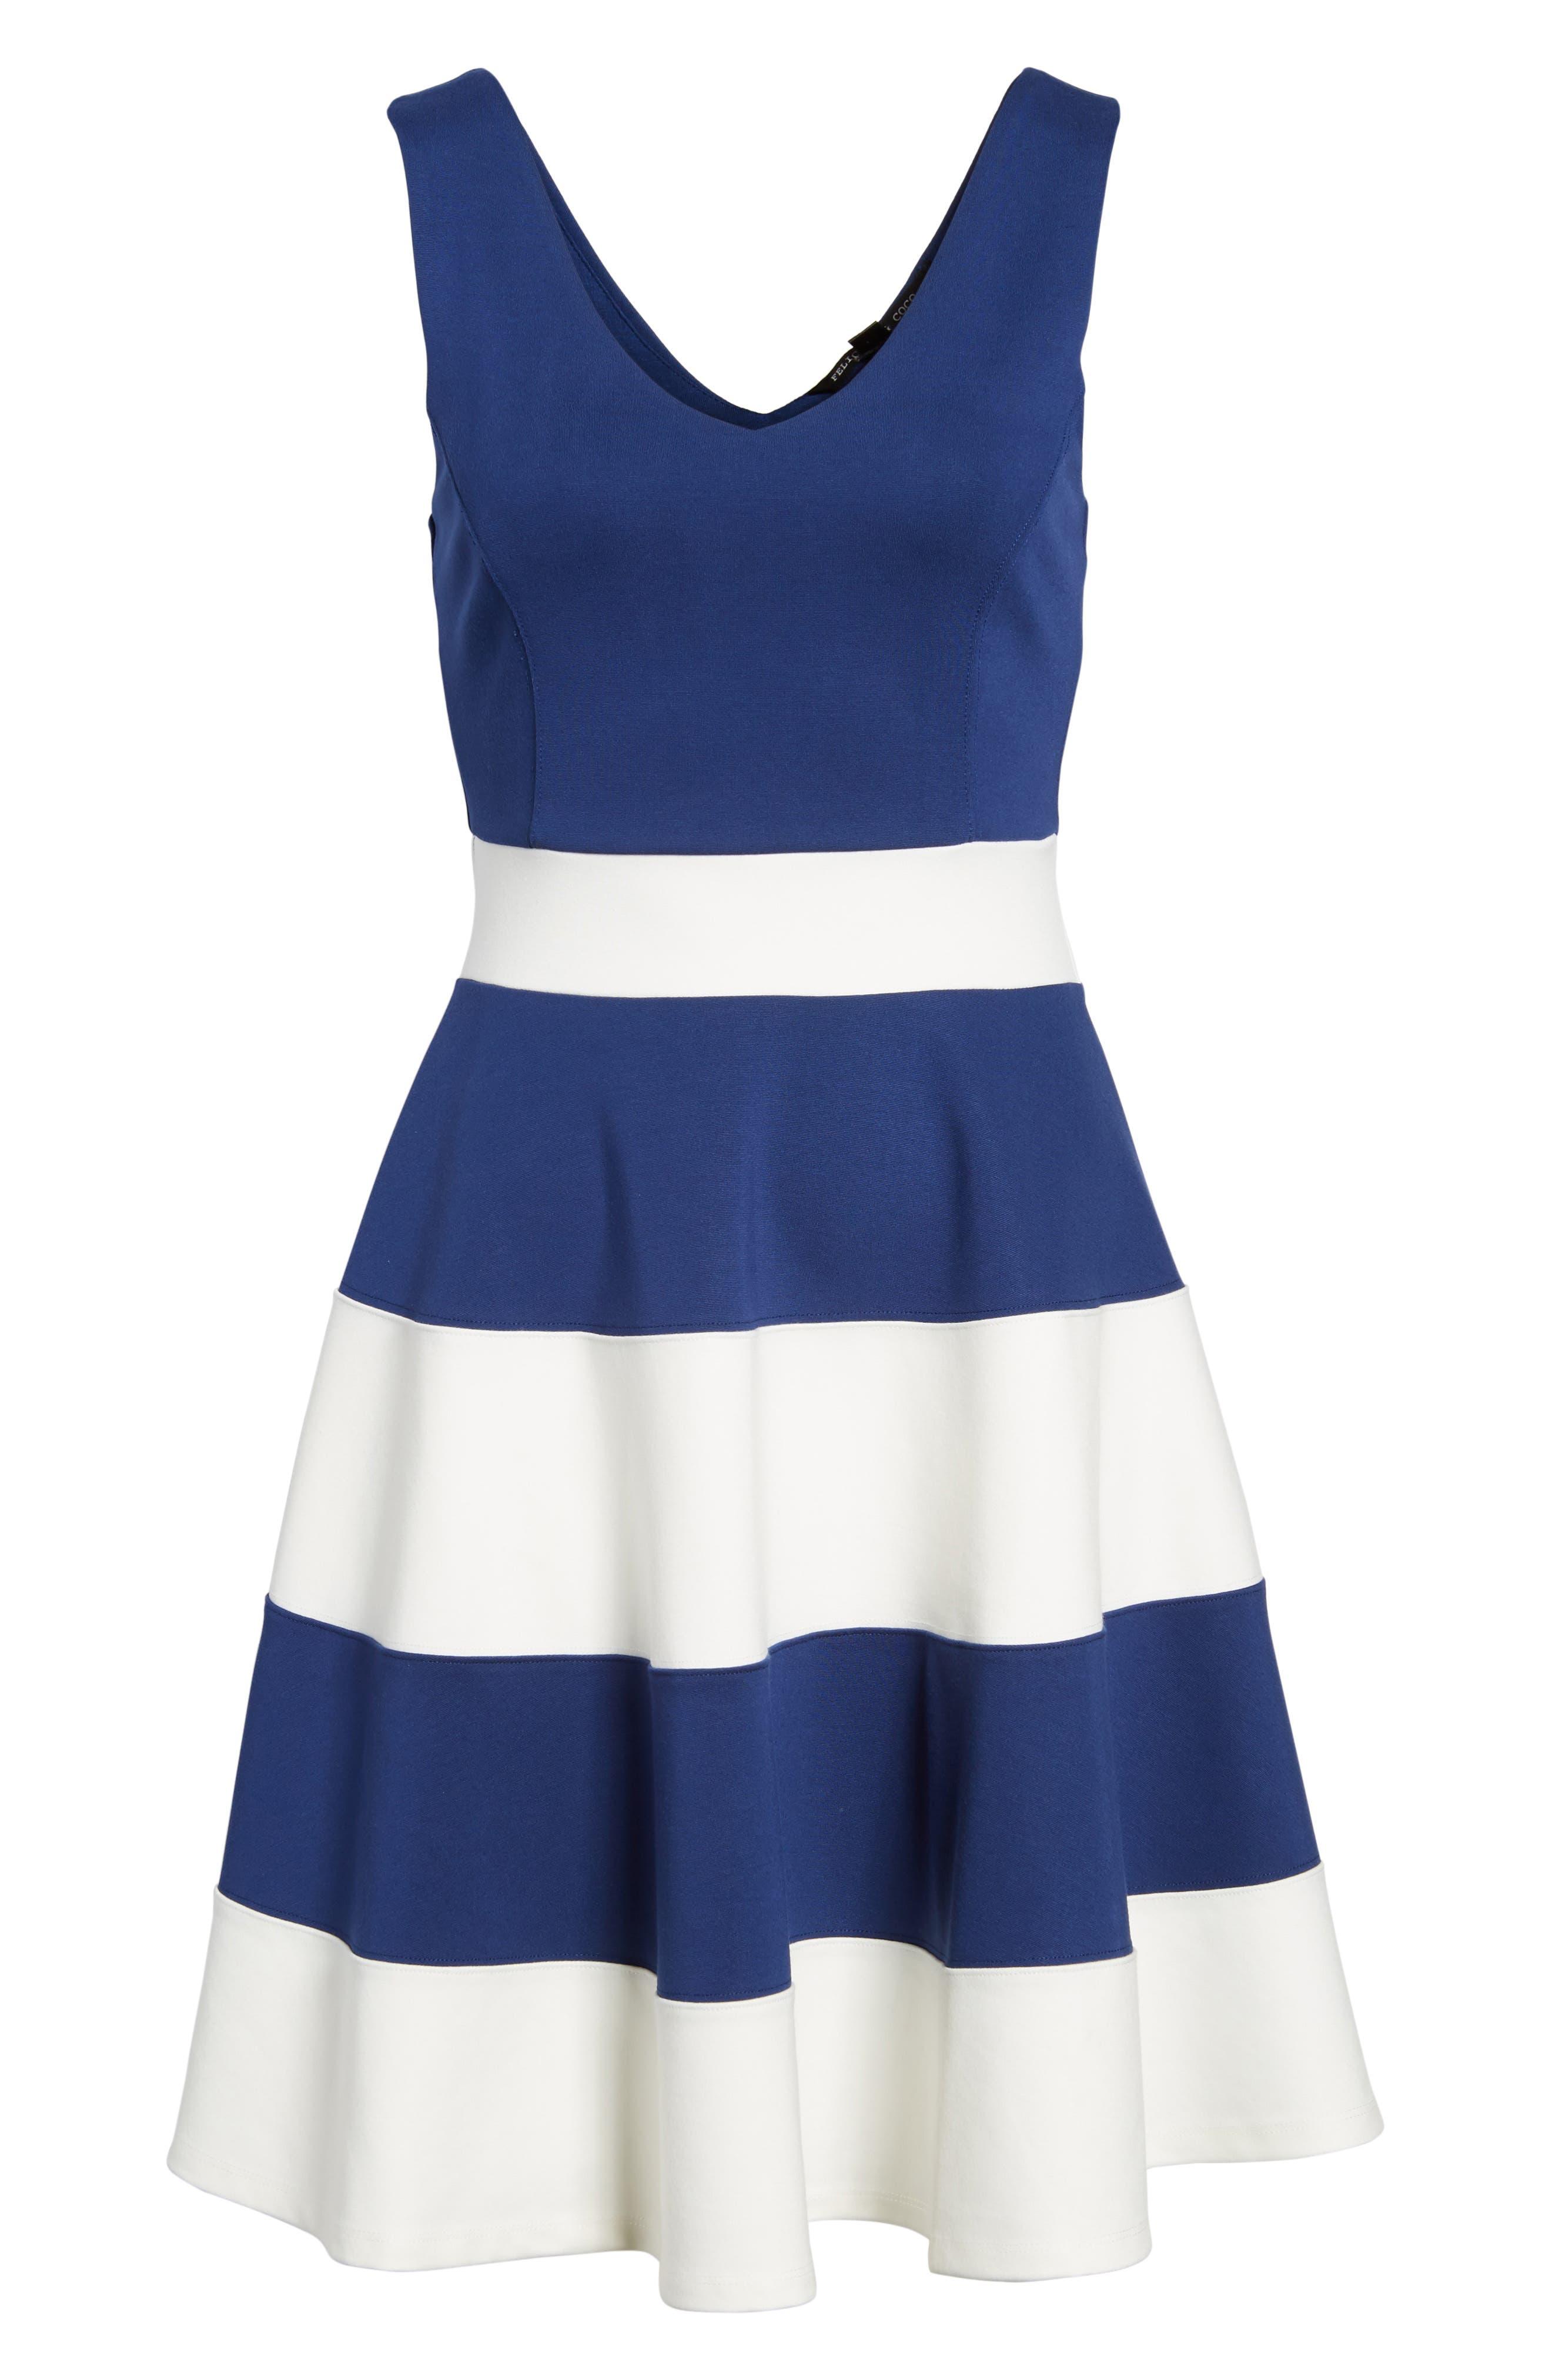 Joice Sleeveless Fit & Flare Dress,                             Alternate thumbnail 6, color,                             409